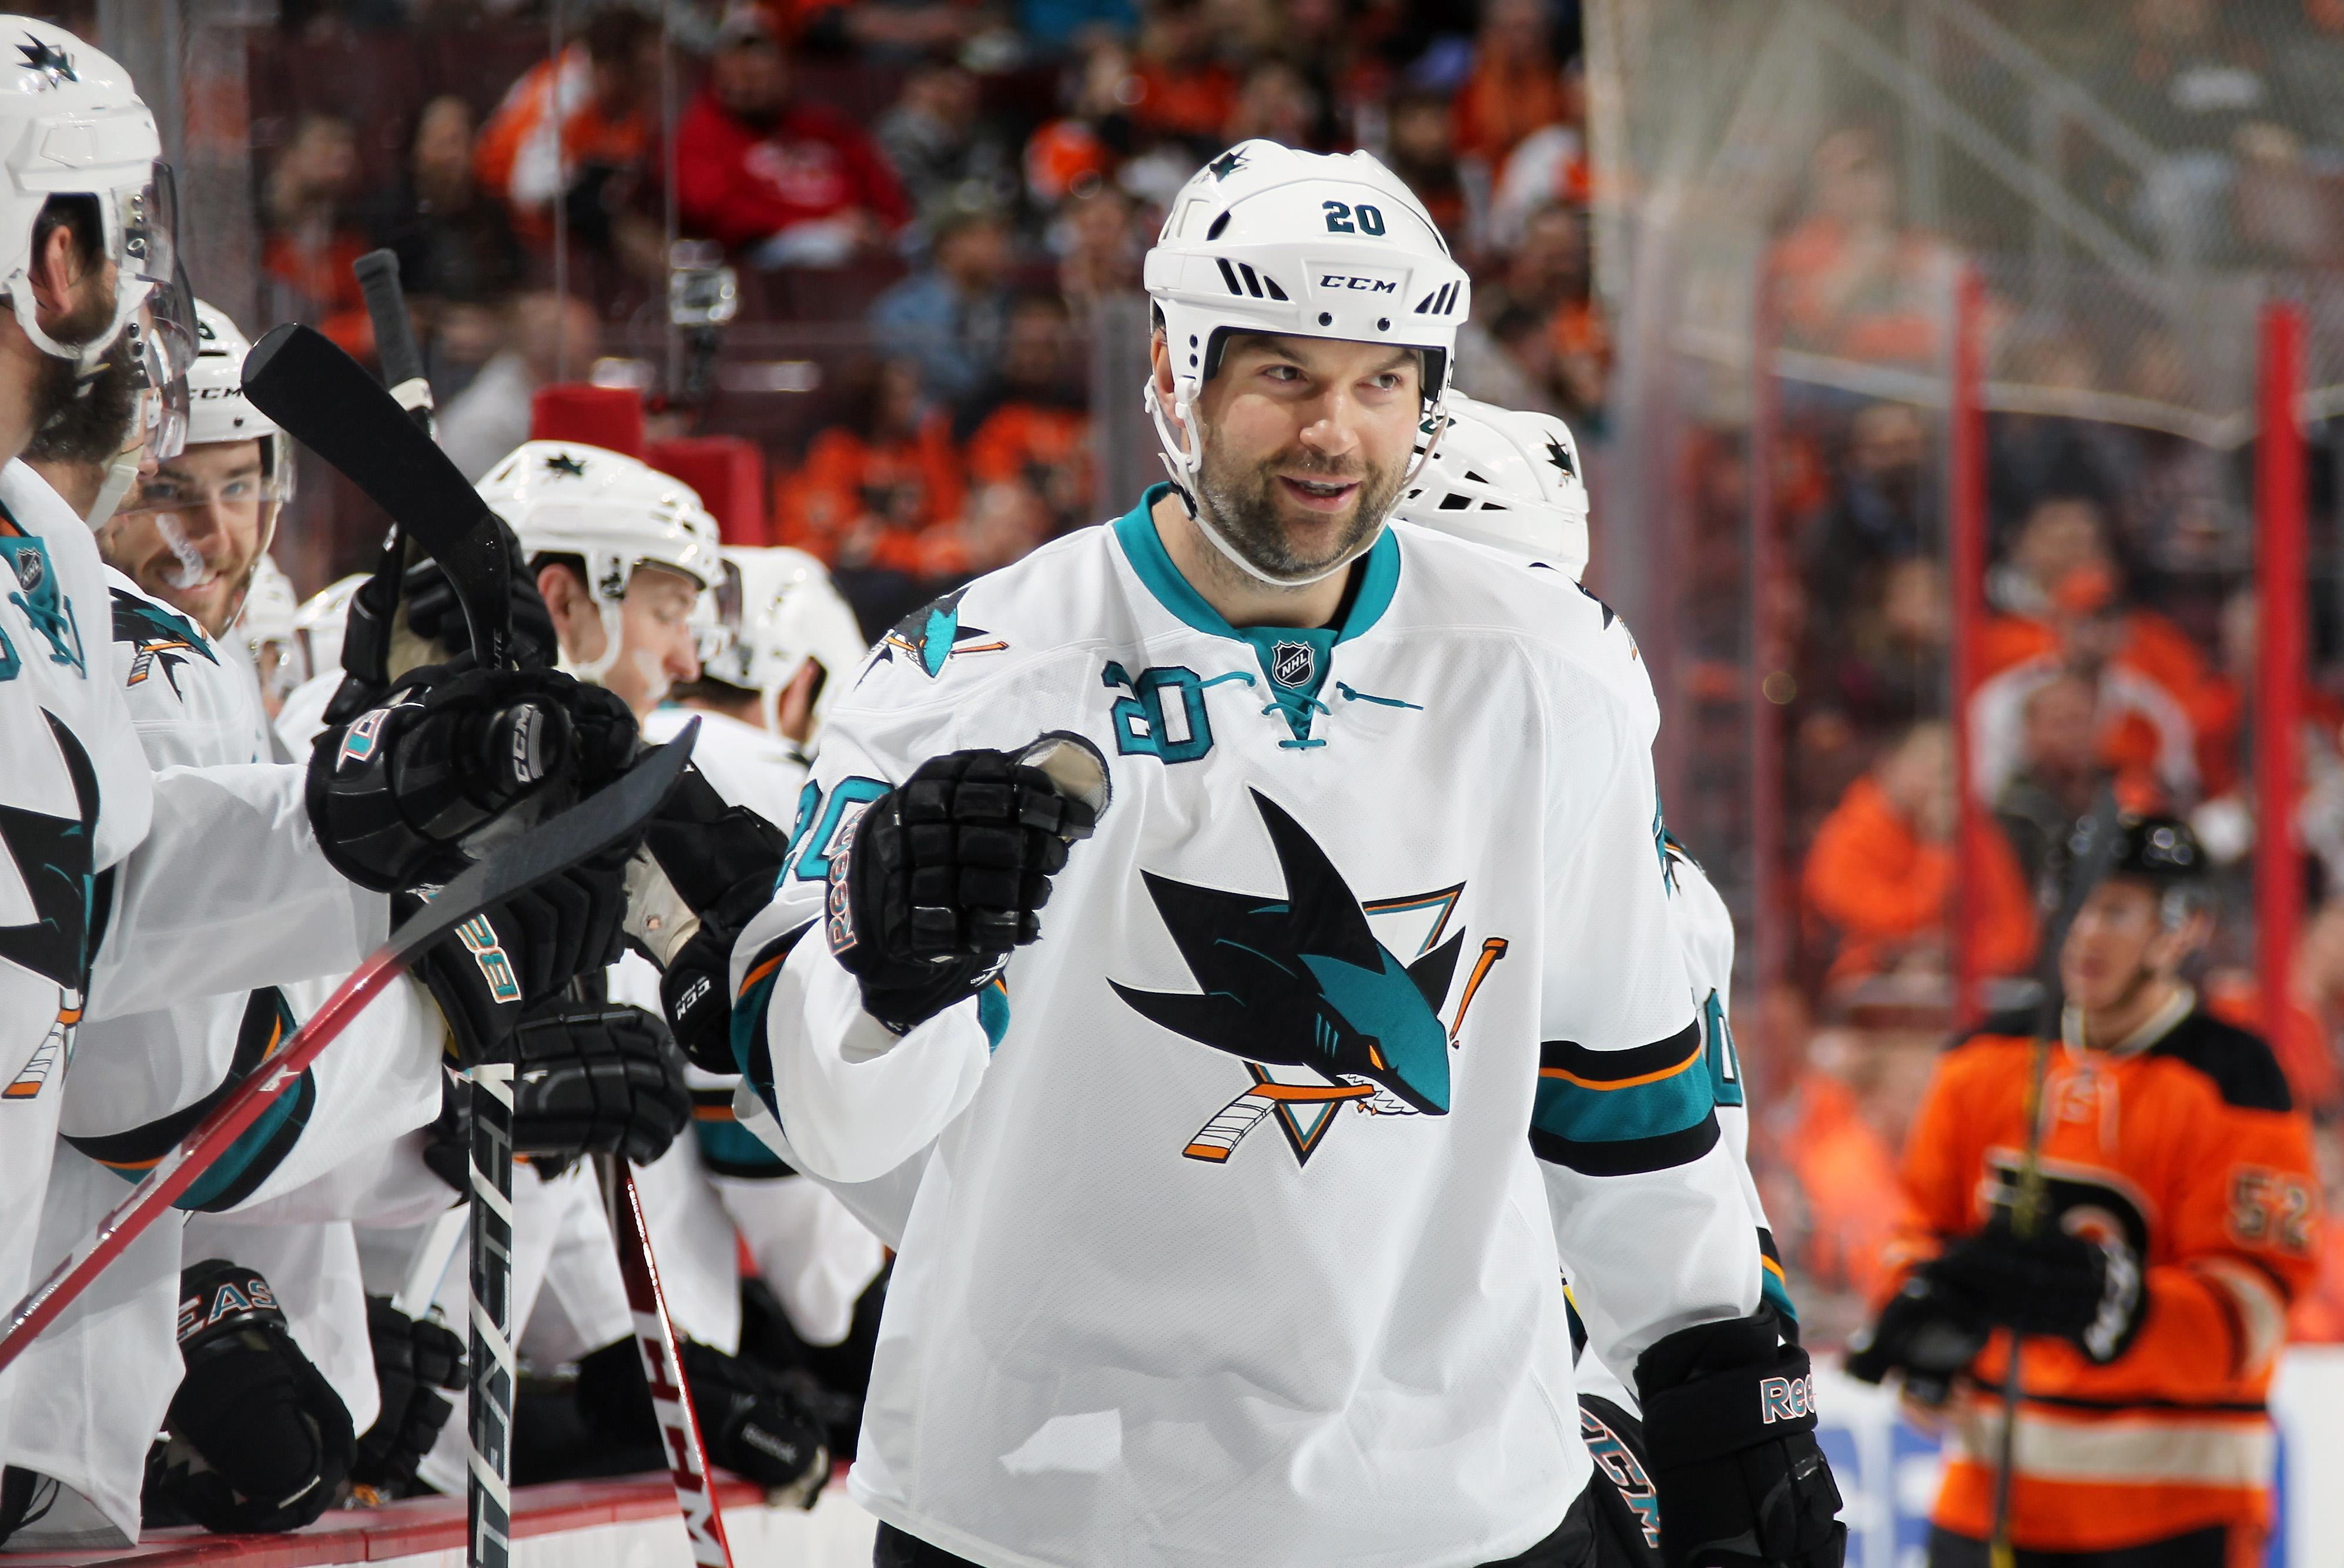 PHILADELPHIA, PA - MARCH 28: John Scott #20 of the San Jose Sharks celebrates a first period goal with teammates against the Philadelphia Flyers on March 28, 2015 at the Wells Fargo Center in Philadelphia, Pennsylvania.